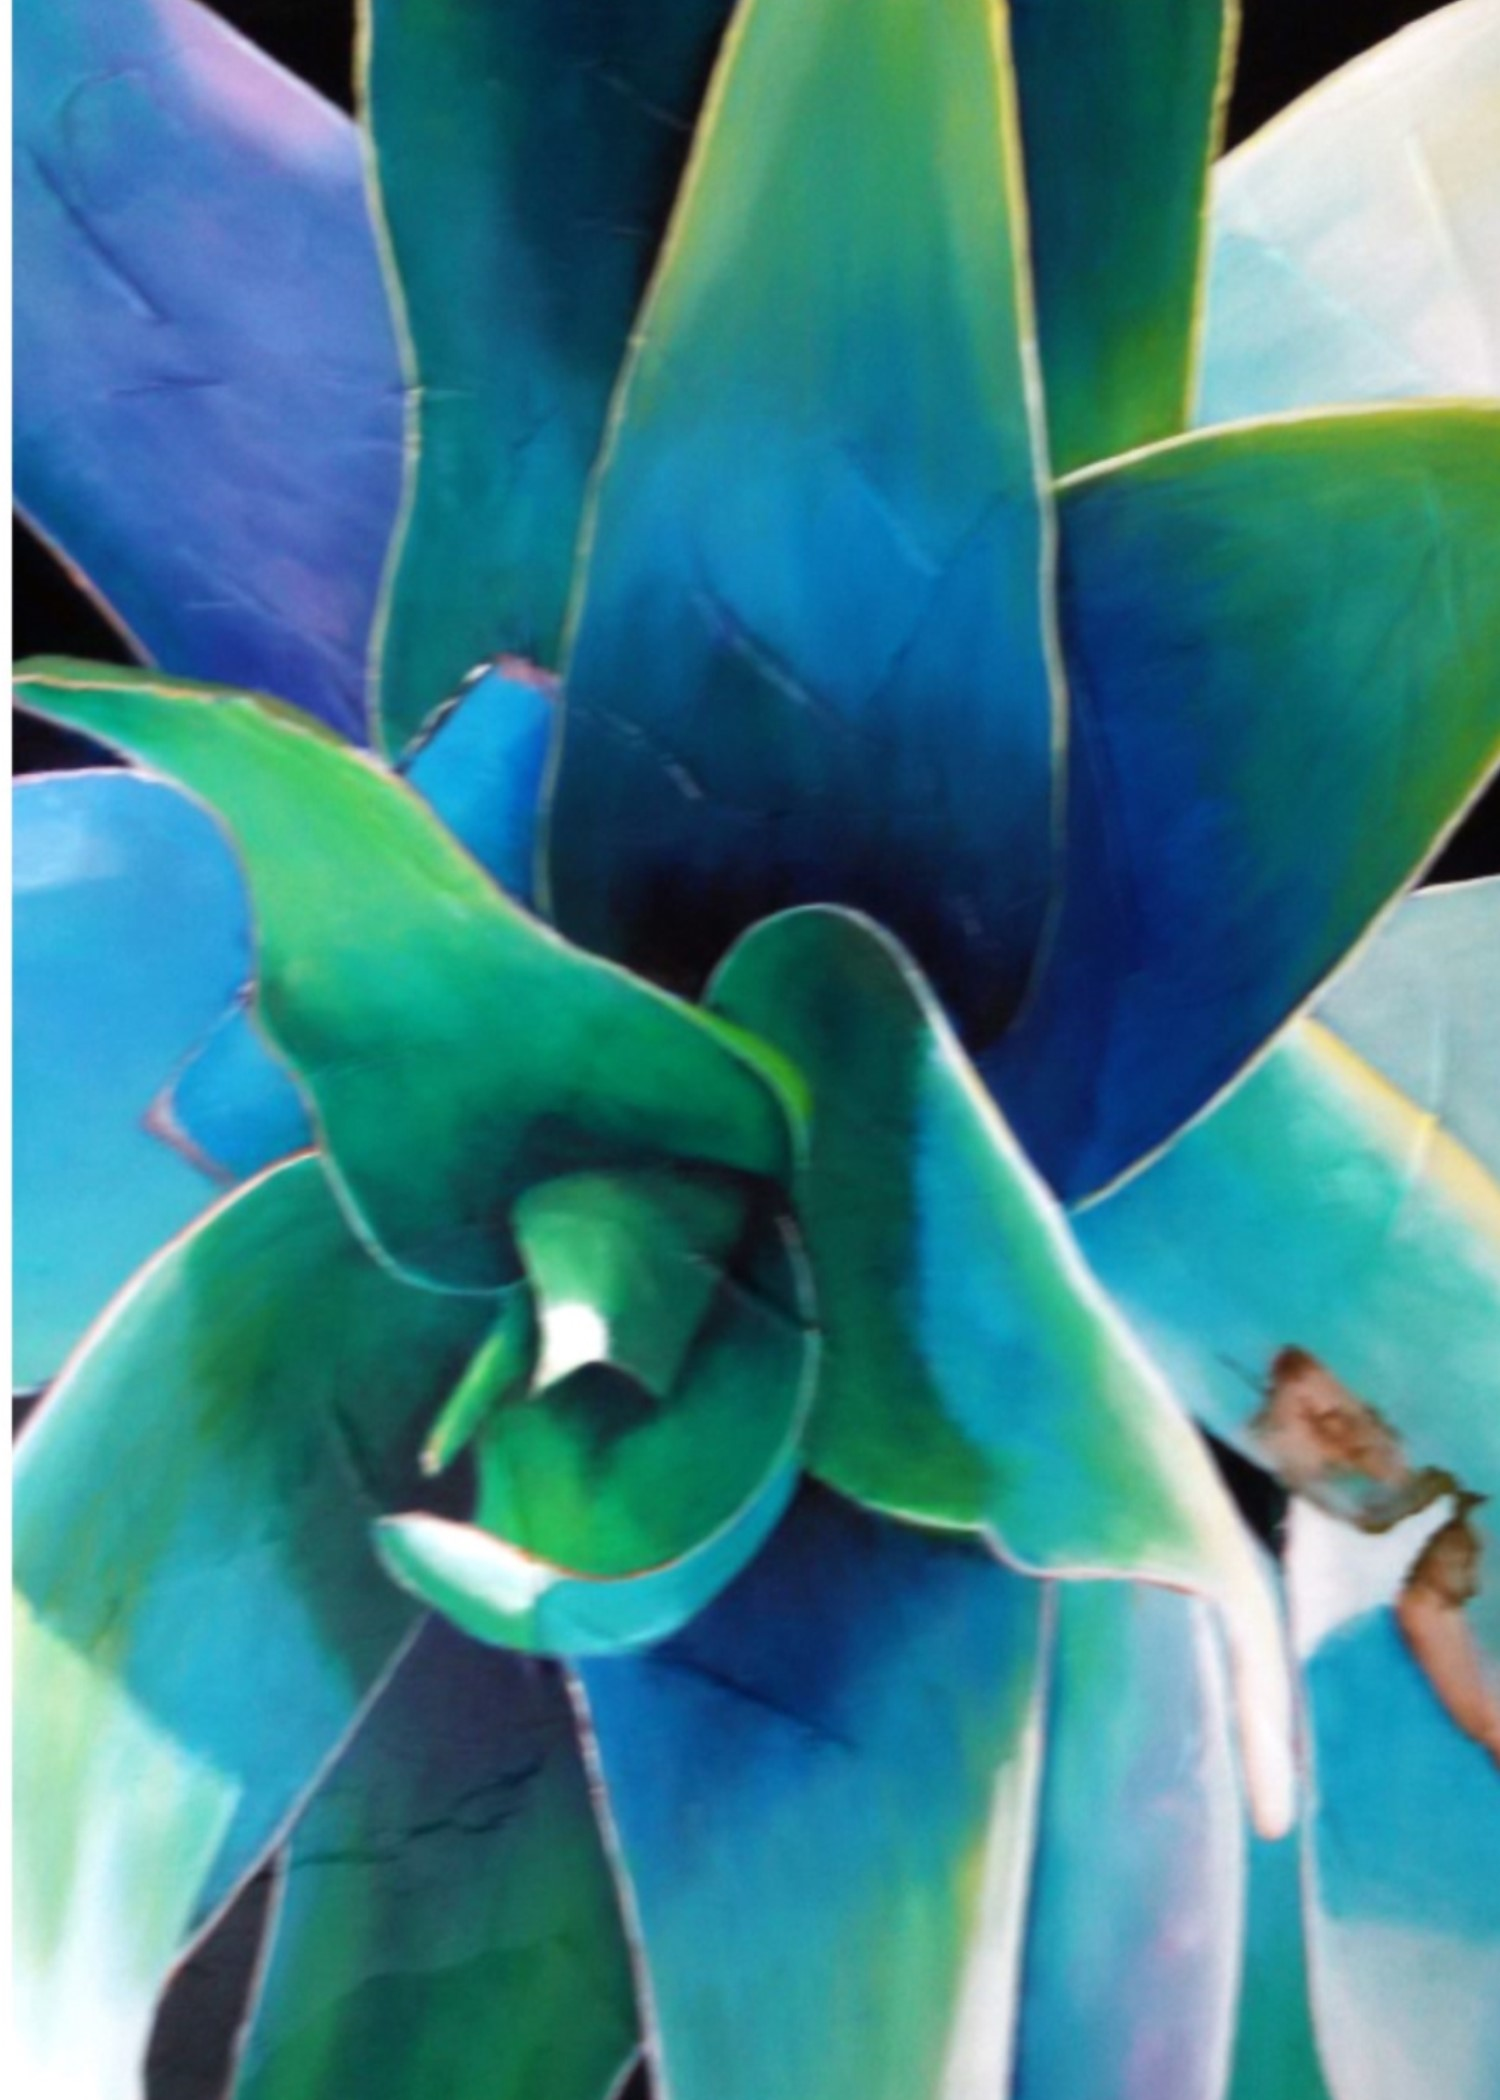 6 CARD NOTECARD SET - DESERT PLANTSAT Bungalow 17 Studio, Palm Springs